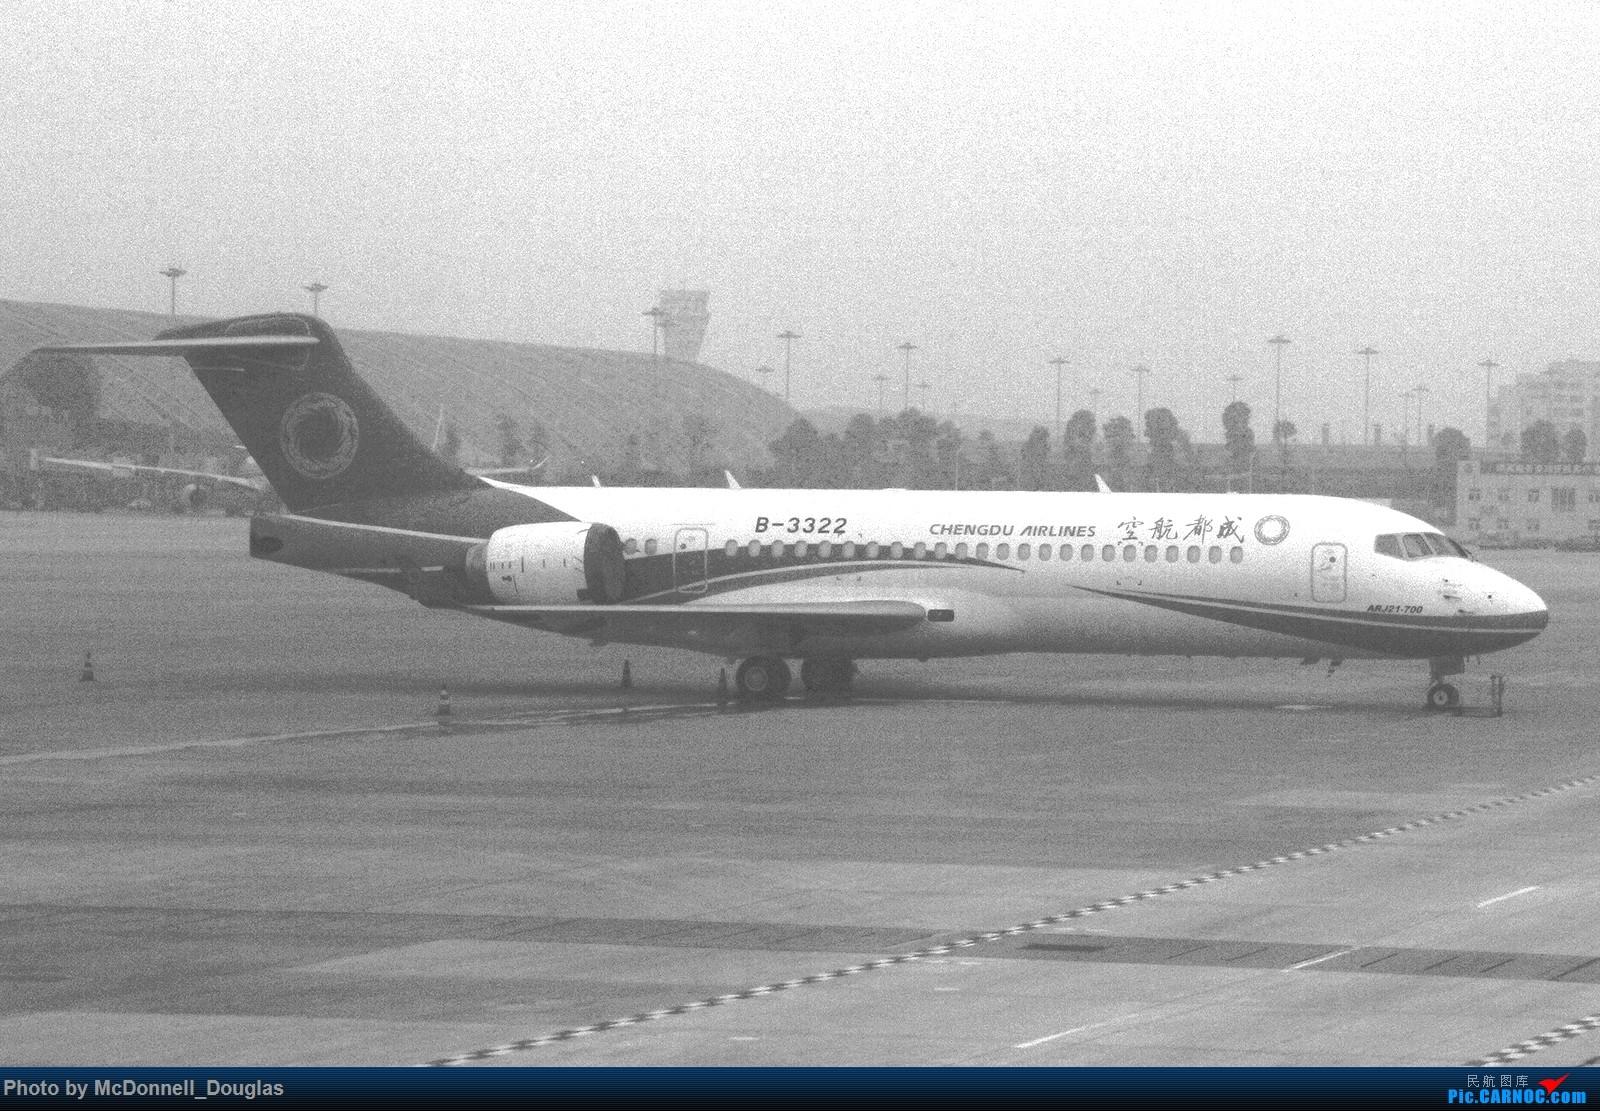 Re:[原创]【上海飞友会】【zc带你游天下(4)】不远千里飞跃喜马拉雅去看你,探寻高山另一边的神秘国度,和一群贫穷却快乐着的人们 COMAC ARJ21-700 B-3322 中国成都双流国际机场